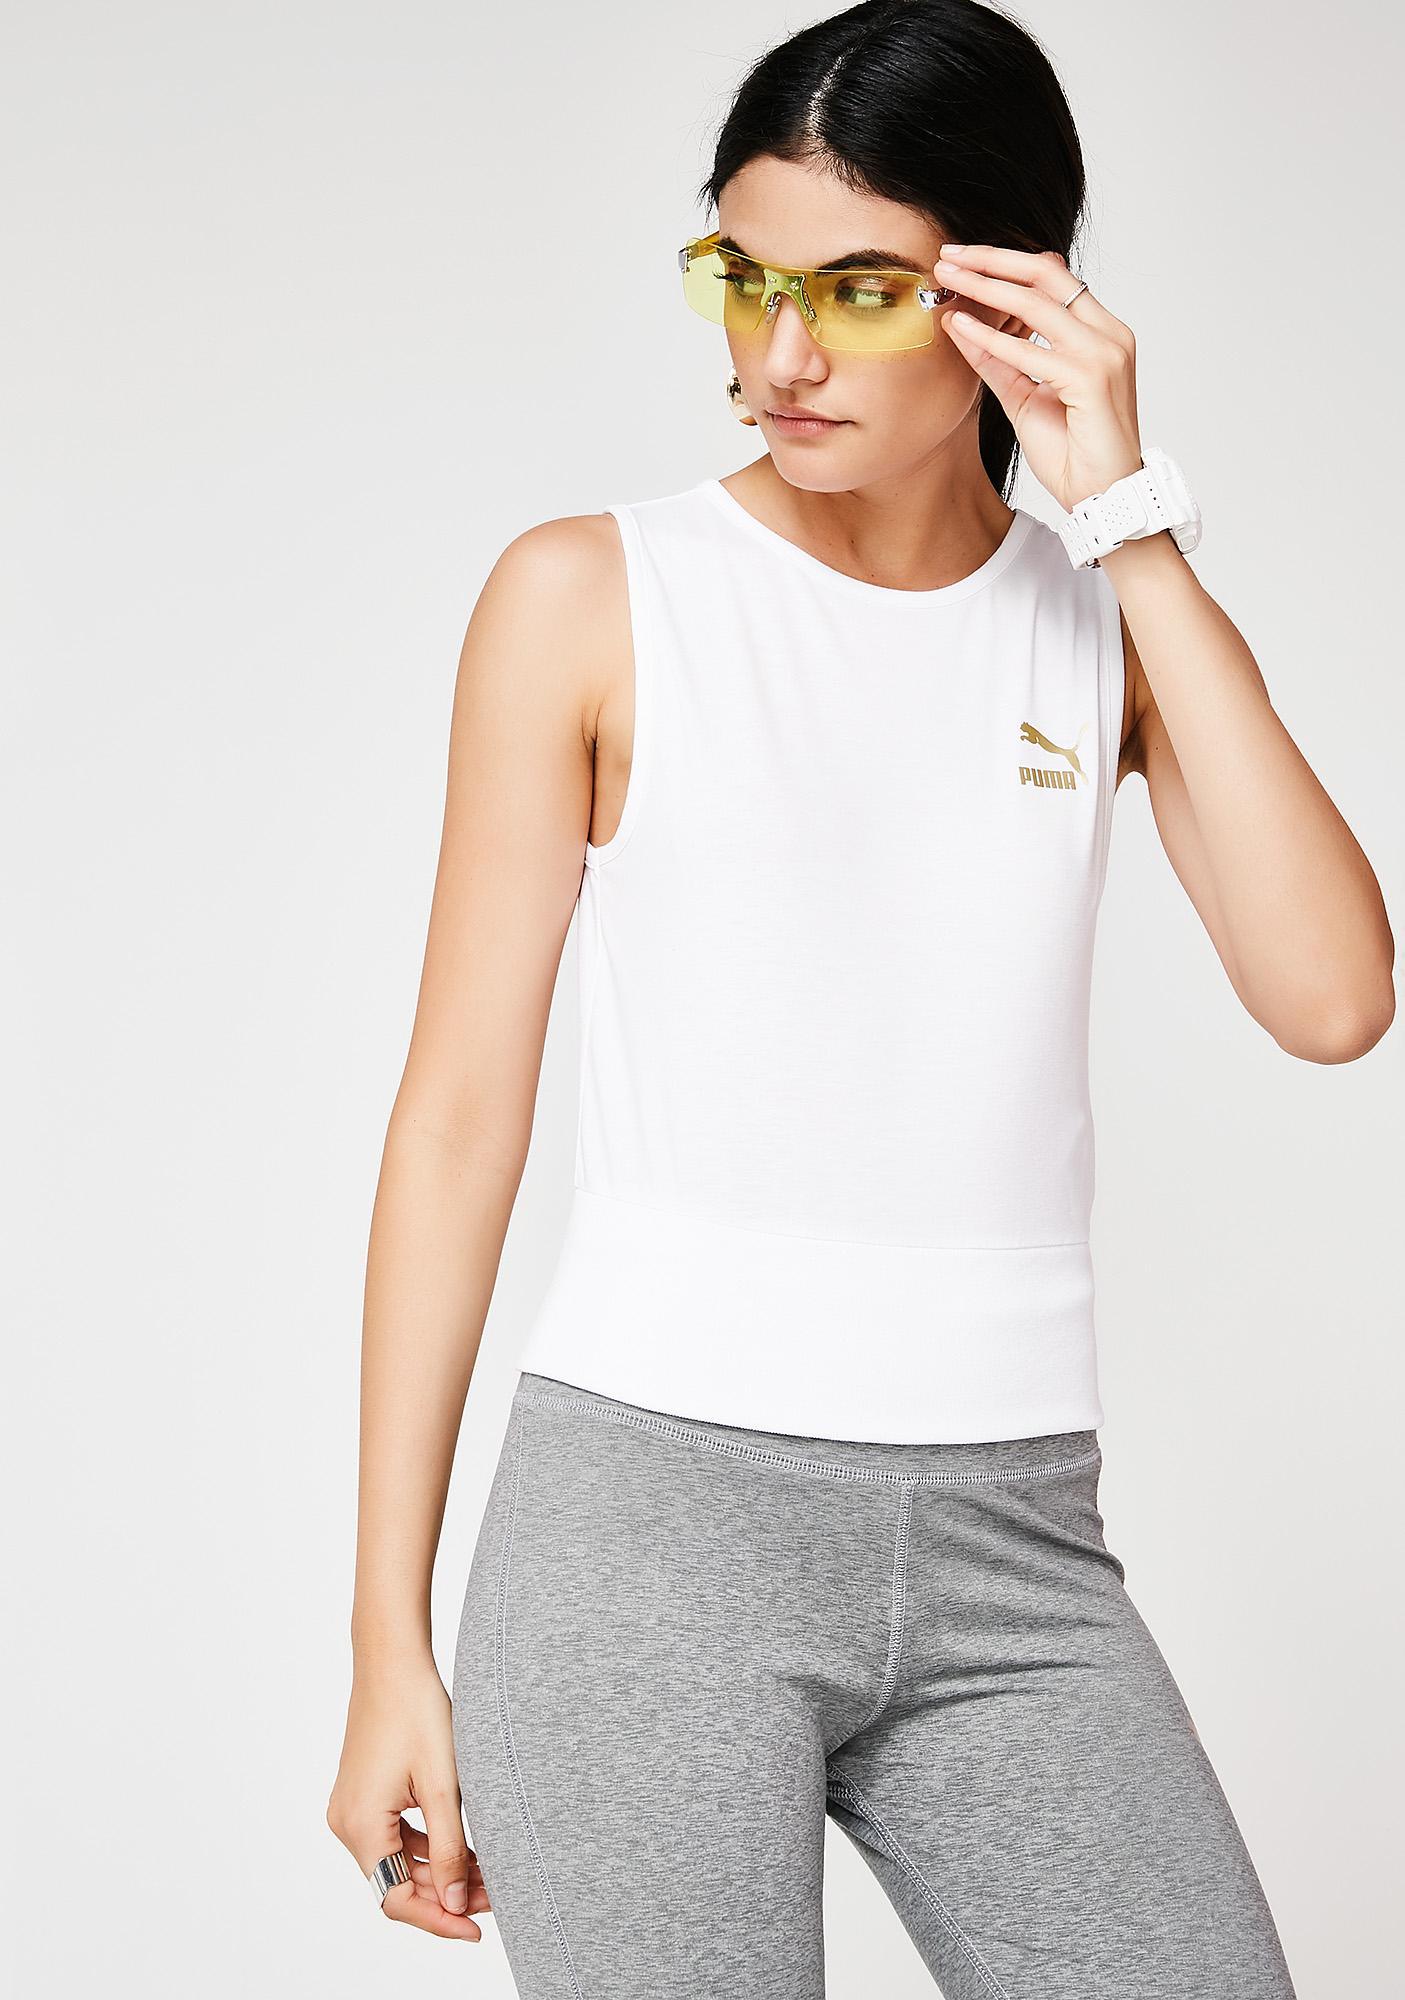 PUMA Fashion Crop Top